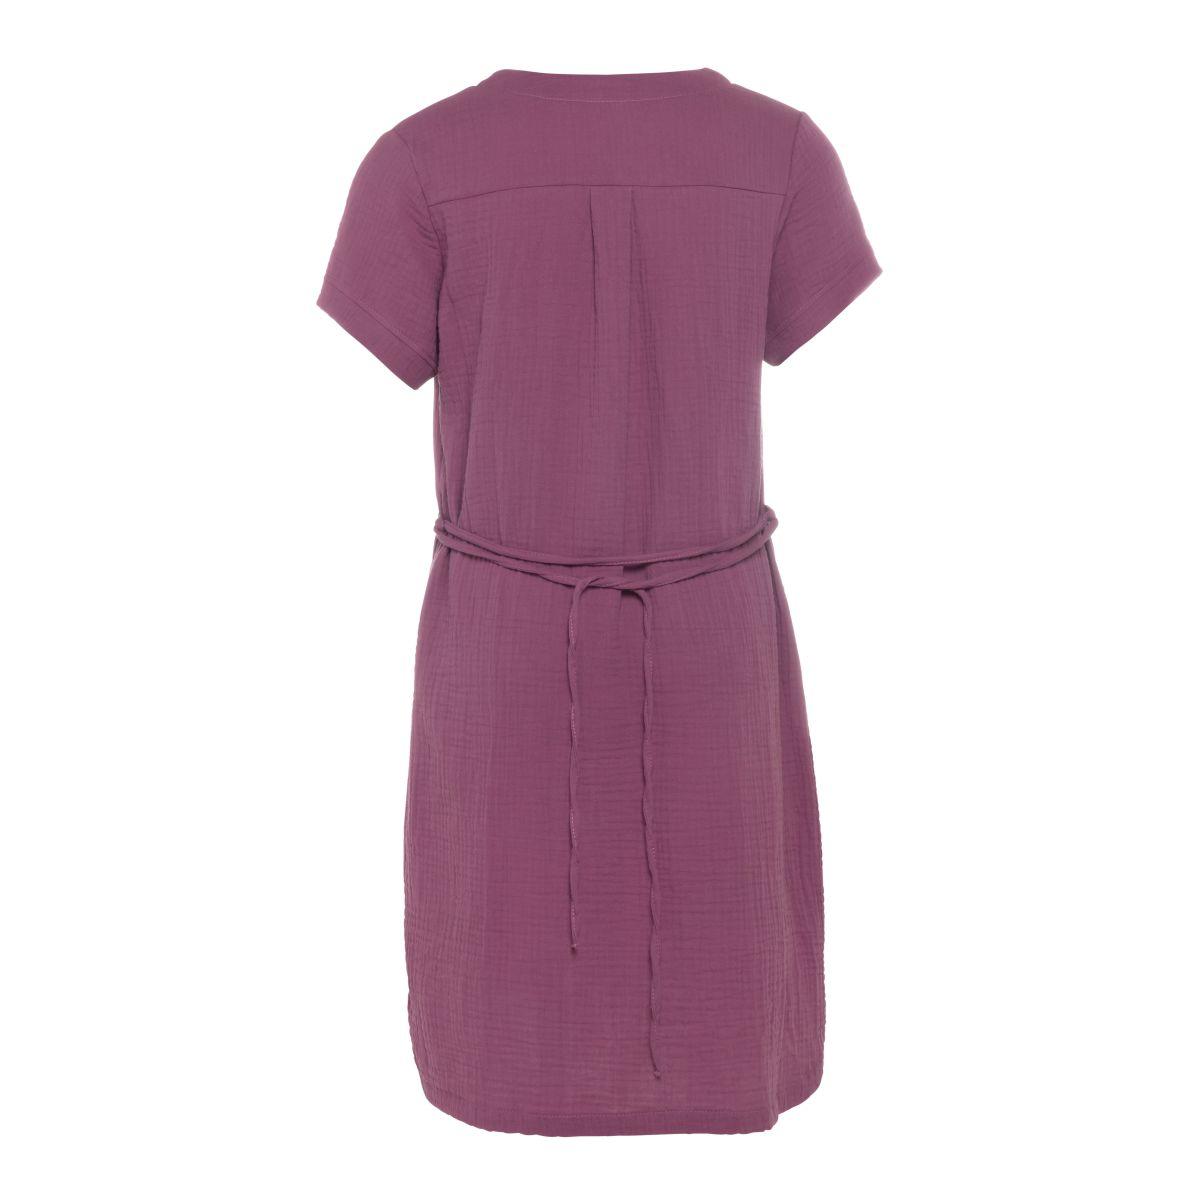 knit factory kf15012004349 indy jurk purple s 2